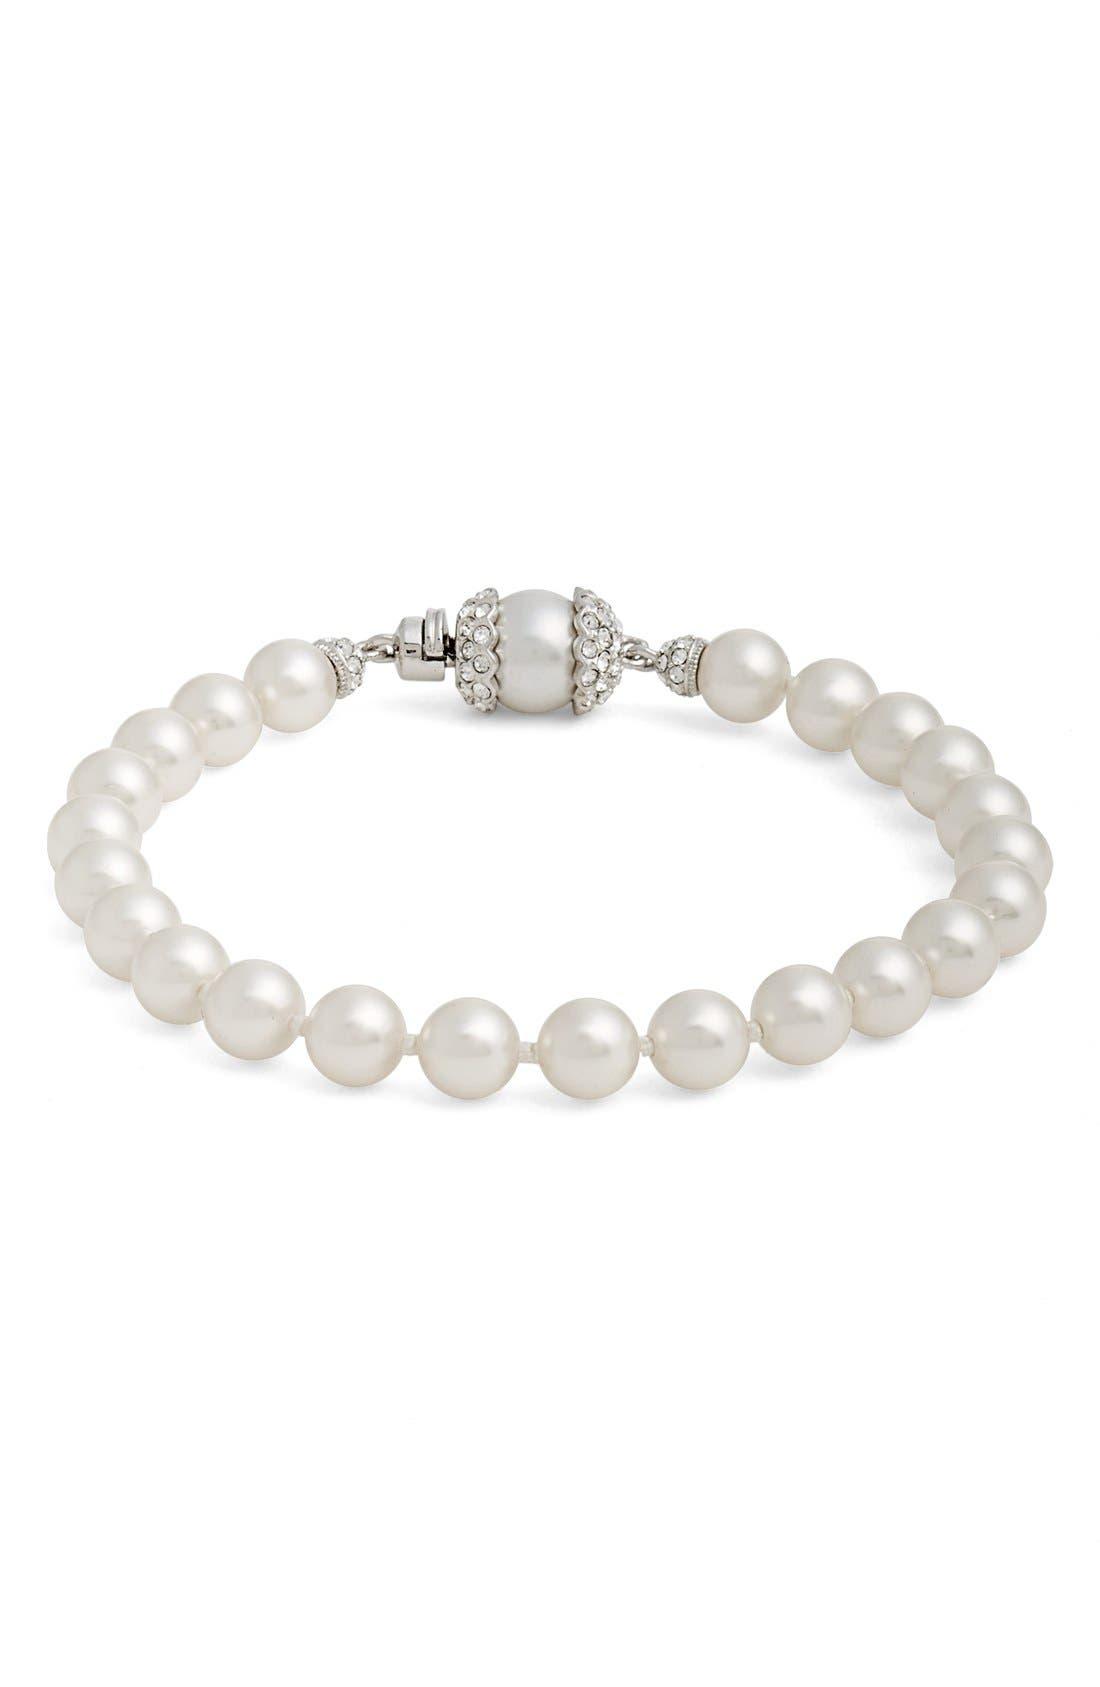 Main Image - NadriImitationPearl Bracelet